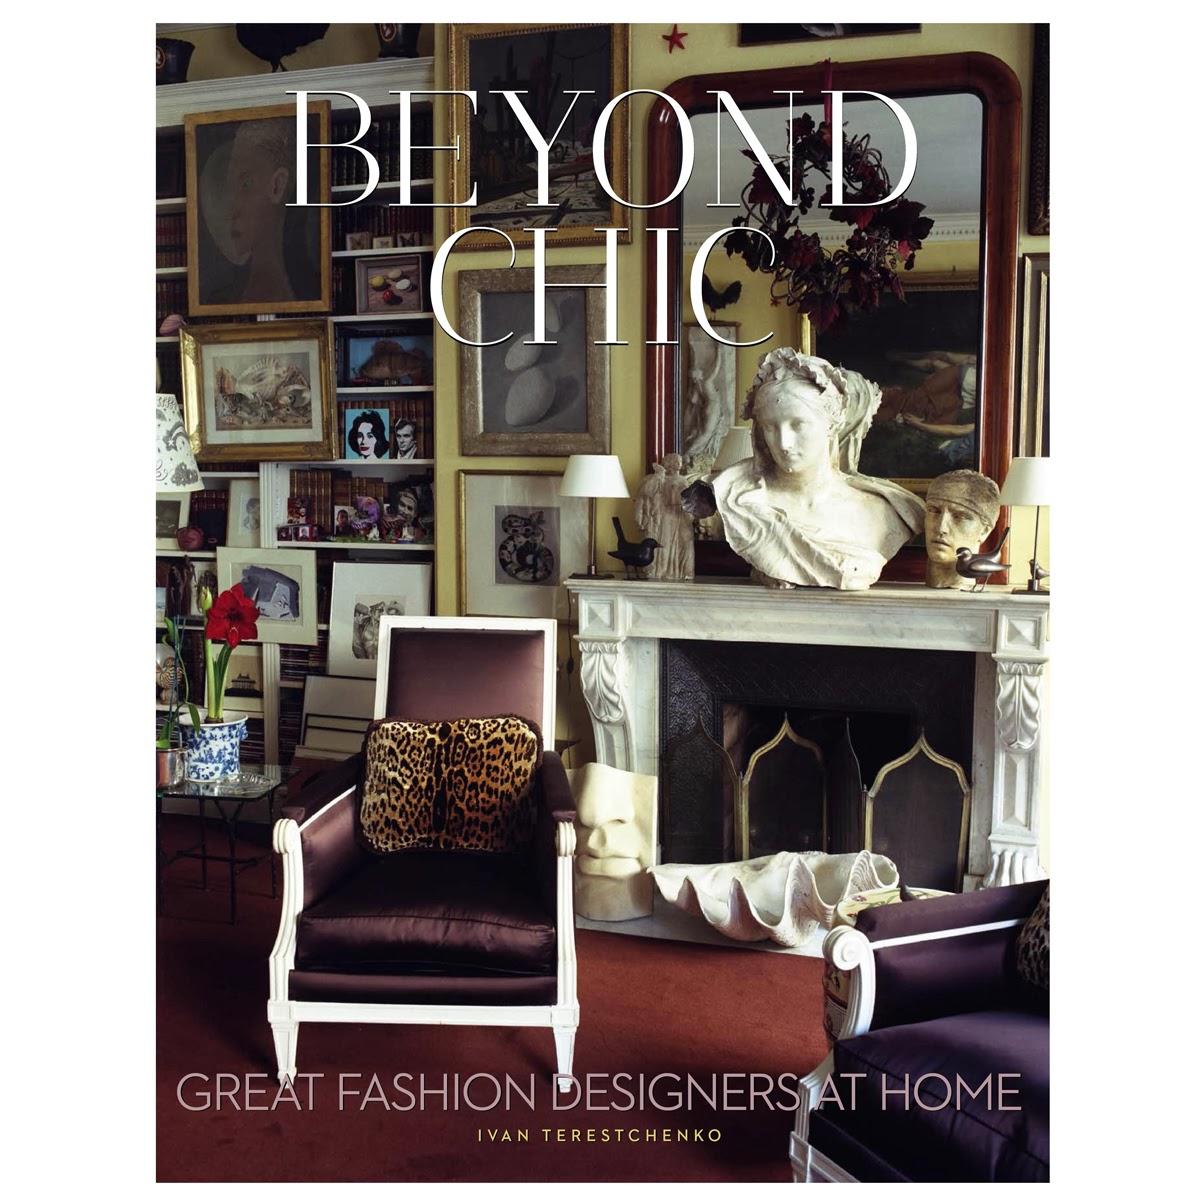 Beyond Chic - Great Fashion Designers at Home: Ivan Terestchenko